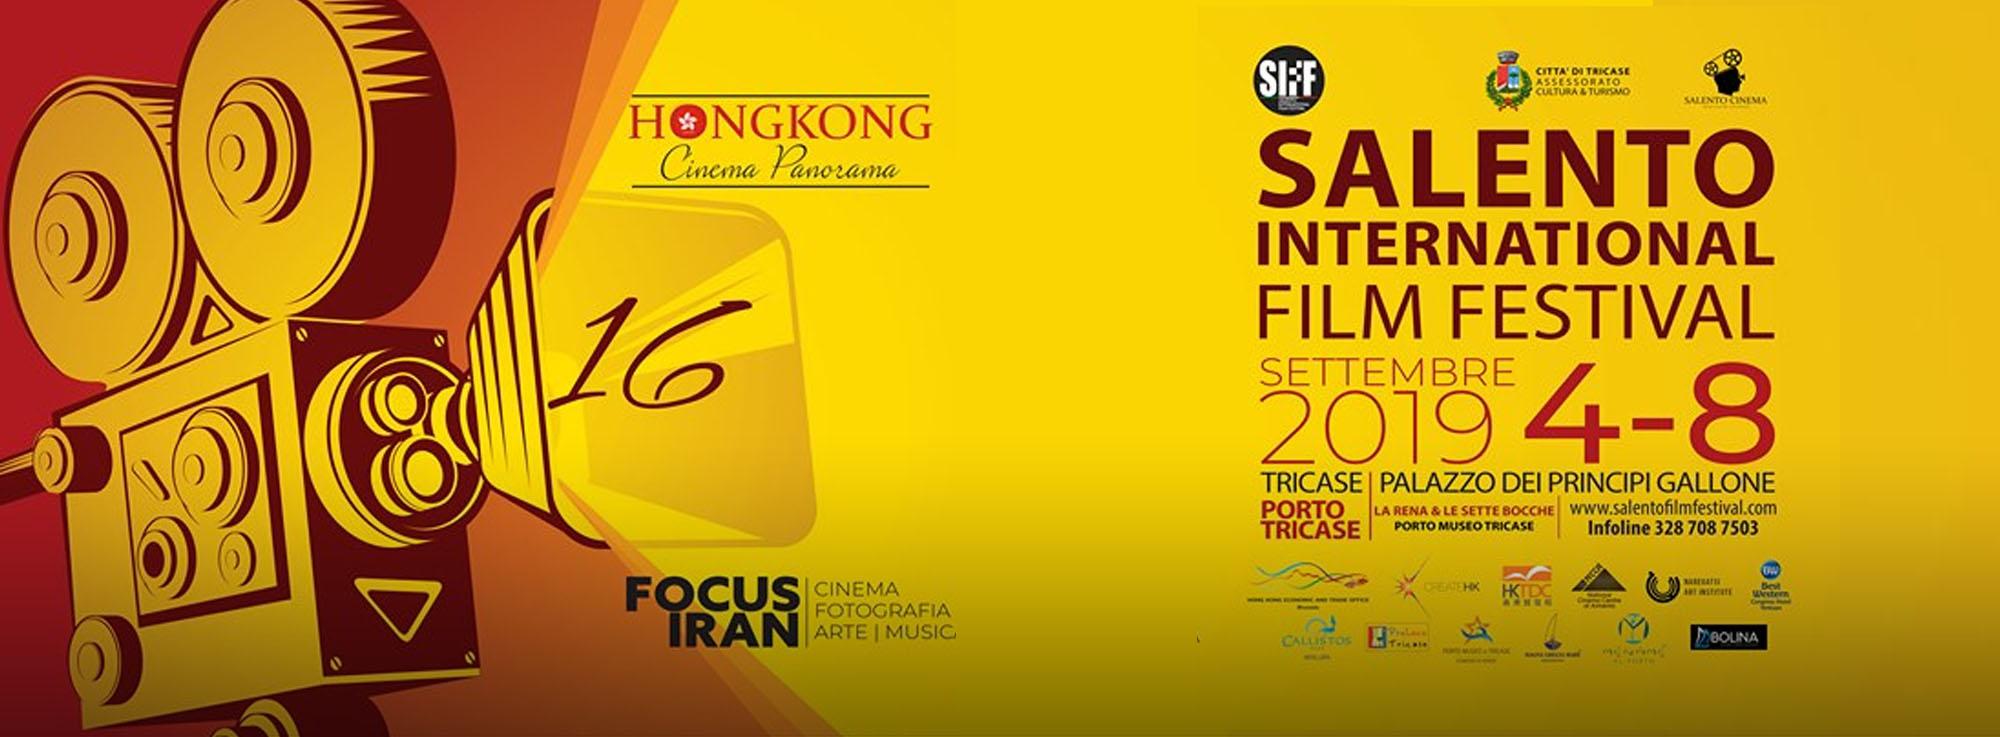 Tricase: Salento International Film Festival